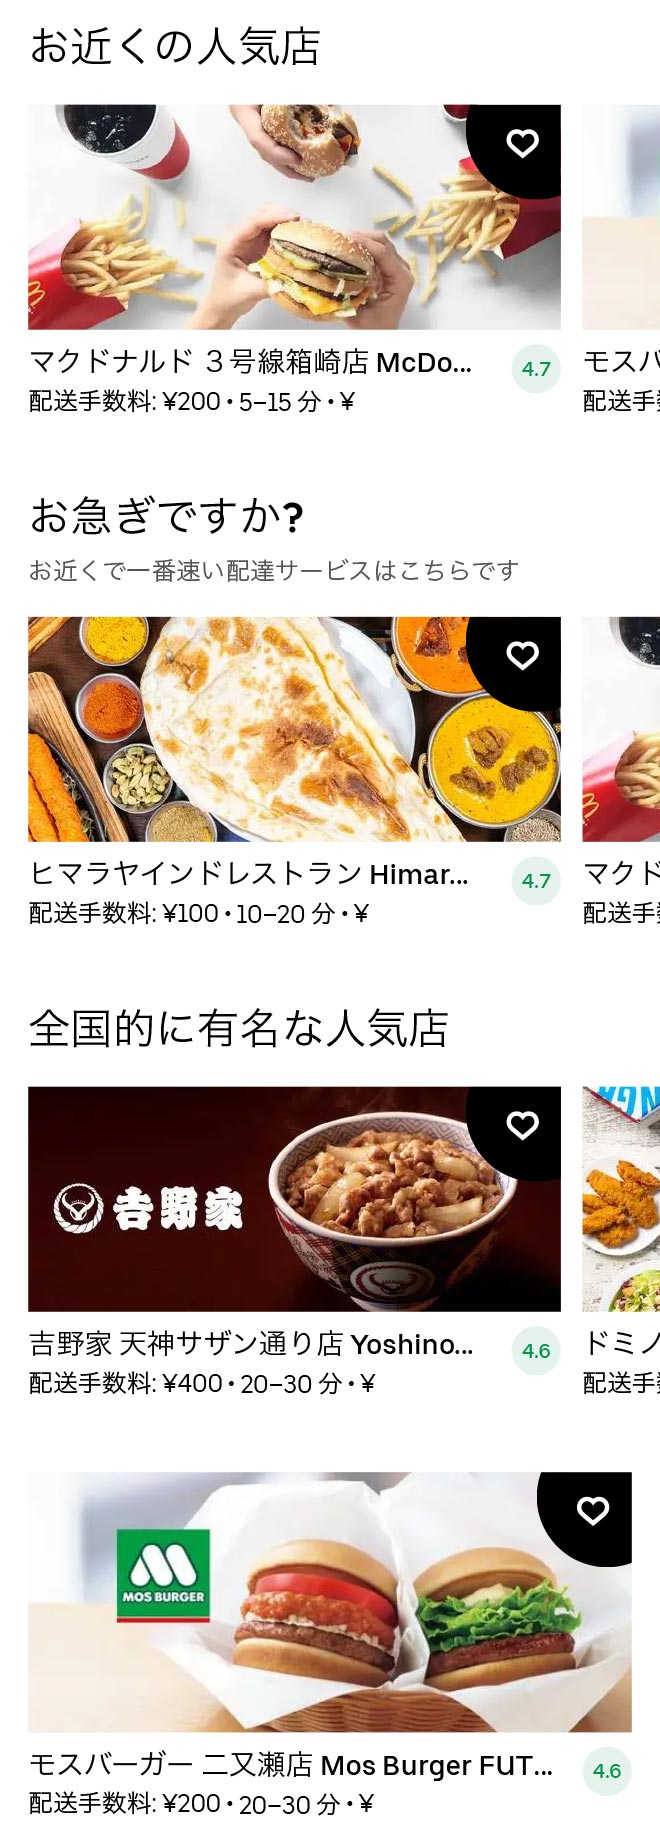 Hakozaki menu 2101 01